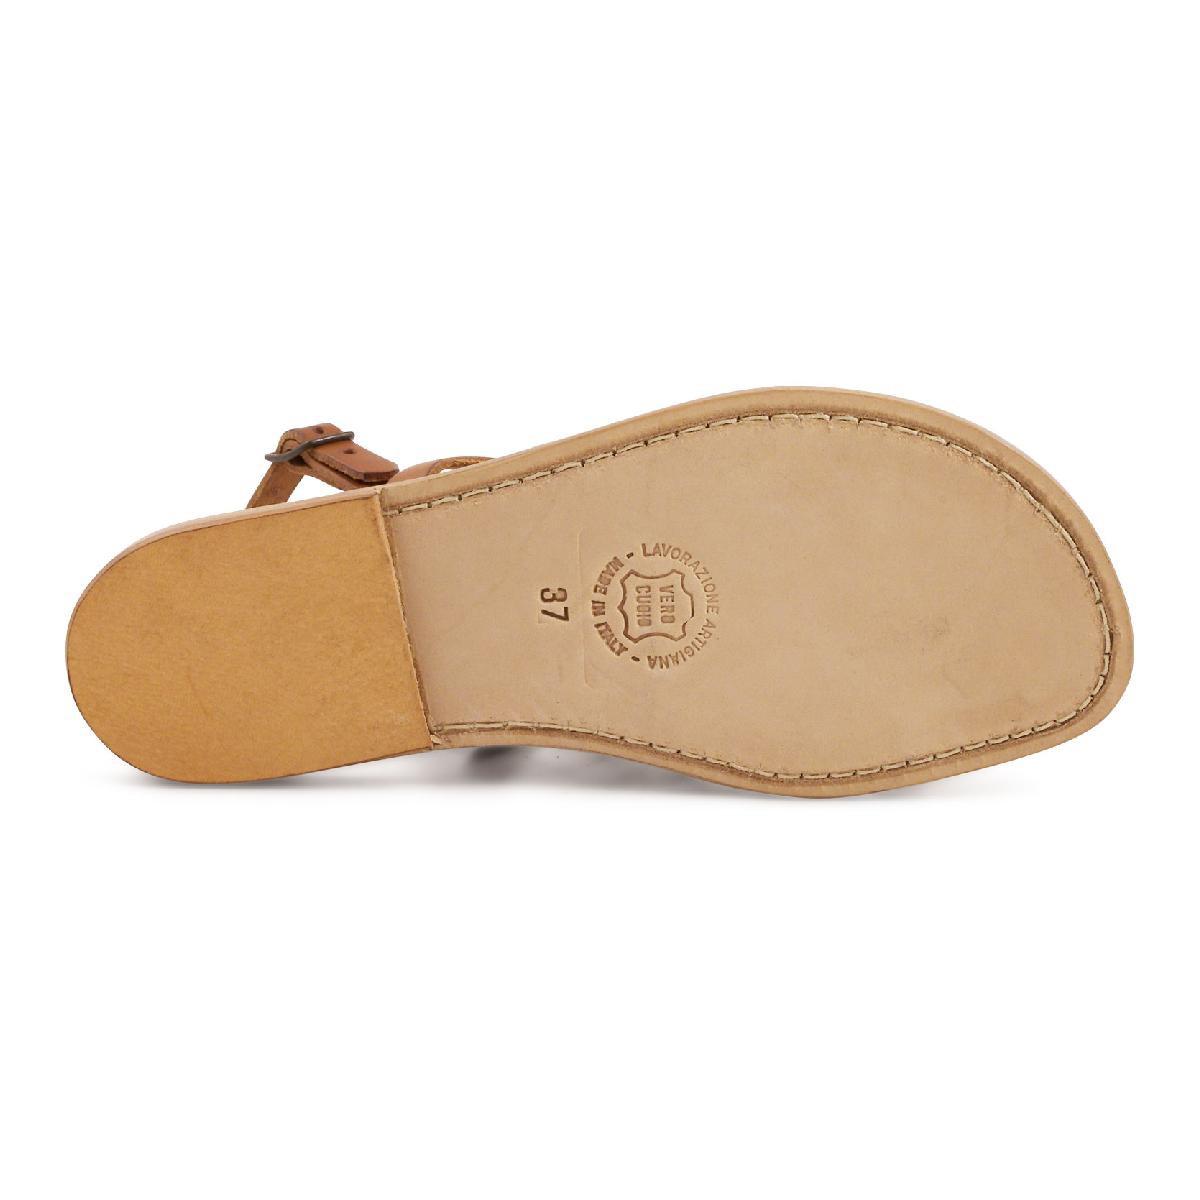 flache sandalen aus echtem leder hand gefertigt in italien gianluca das leder handwerker. Black Bedroom Furniture Sets. Home Design Ideas